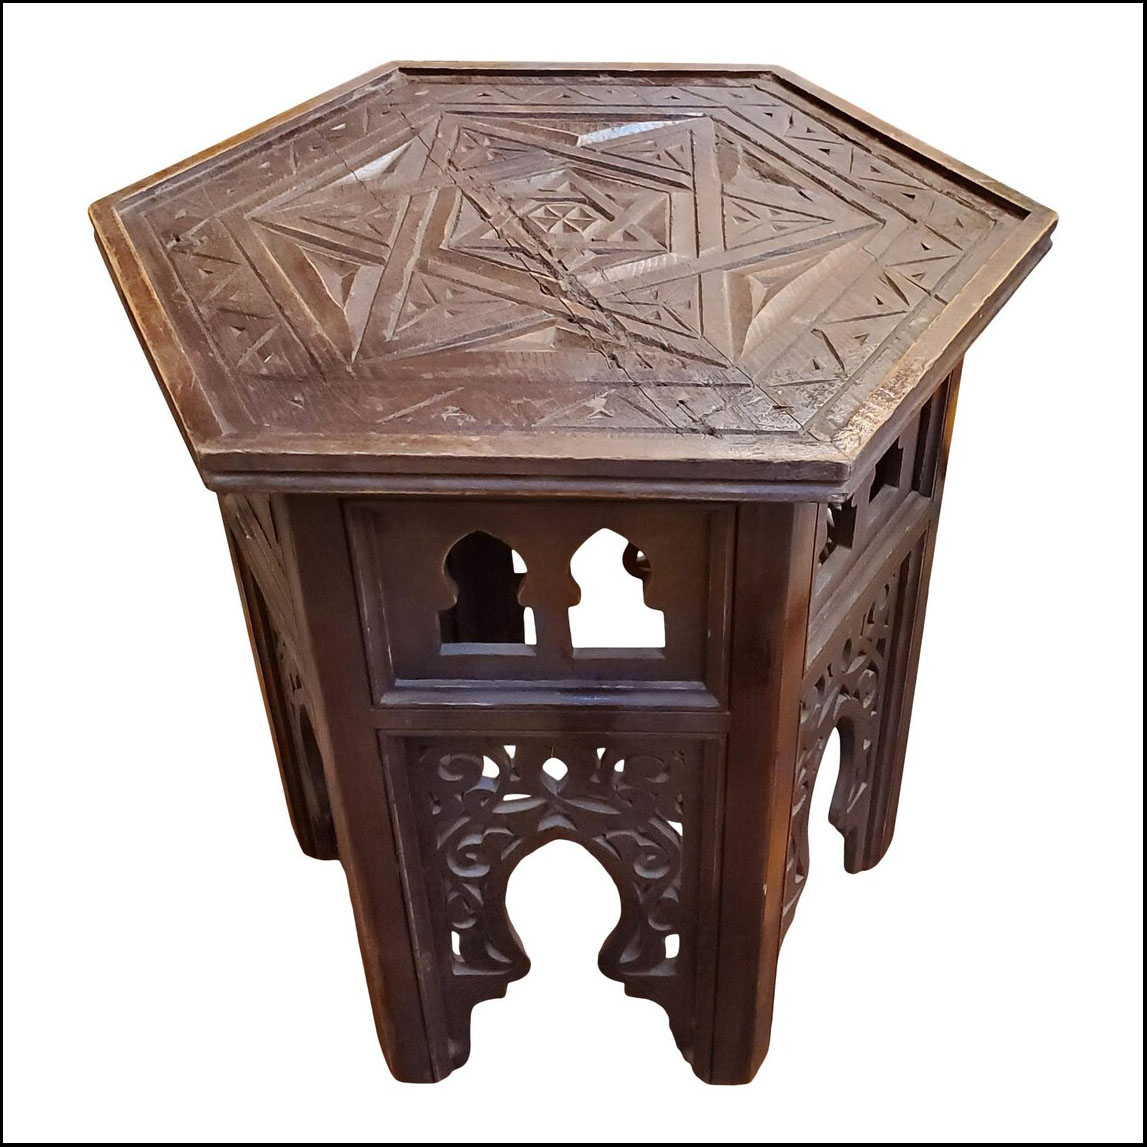 Moroccan Hexagonal Wooden Side Table